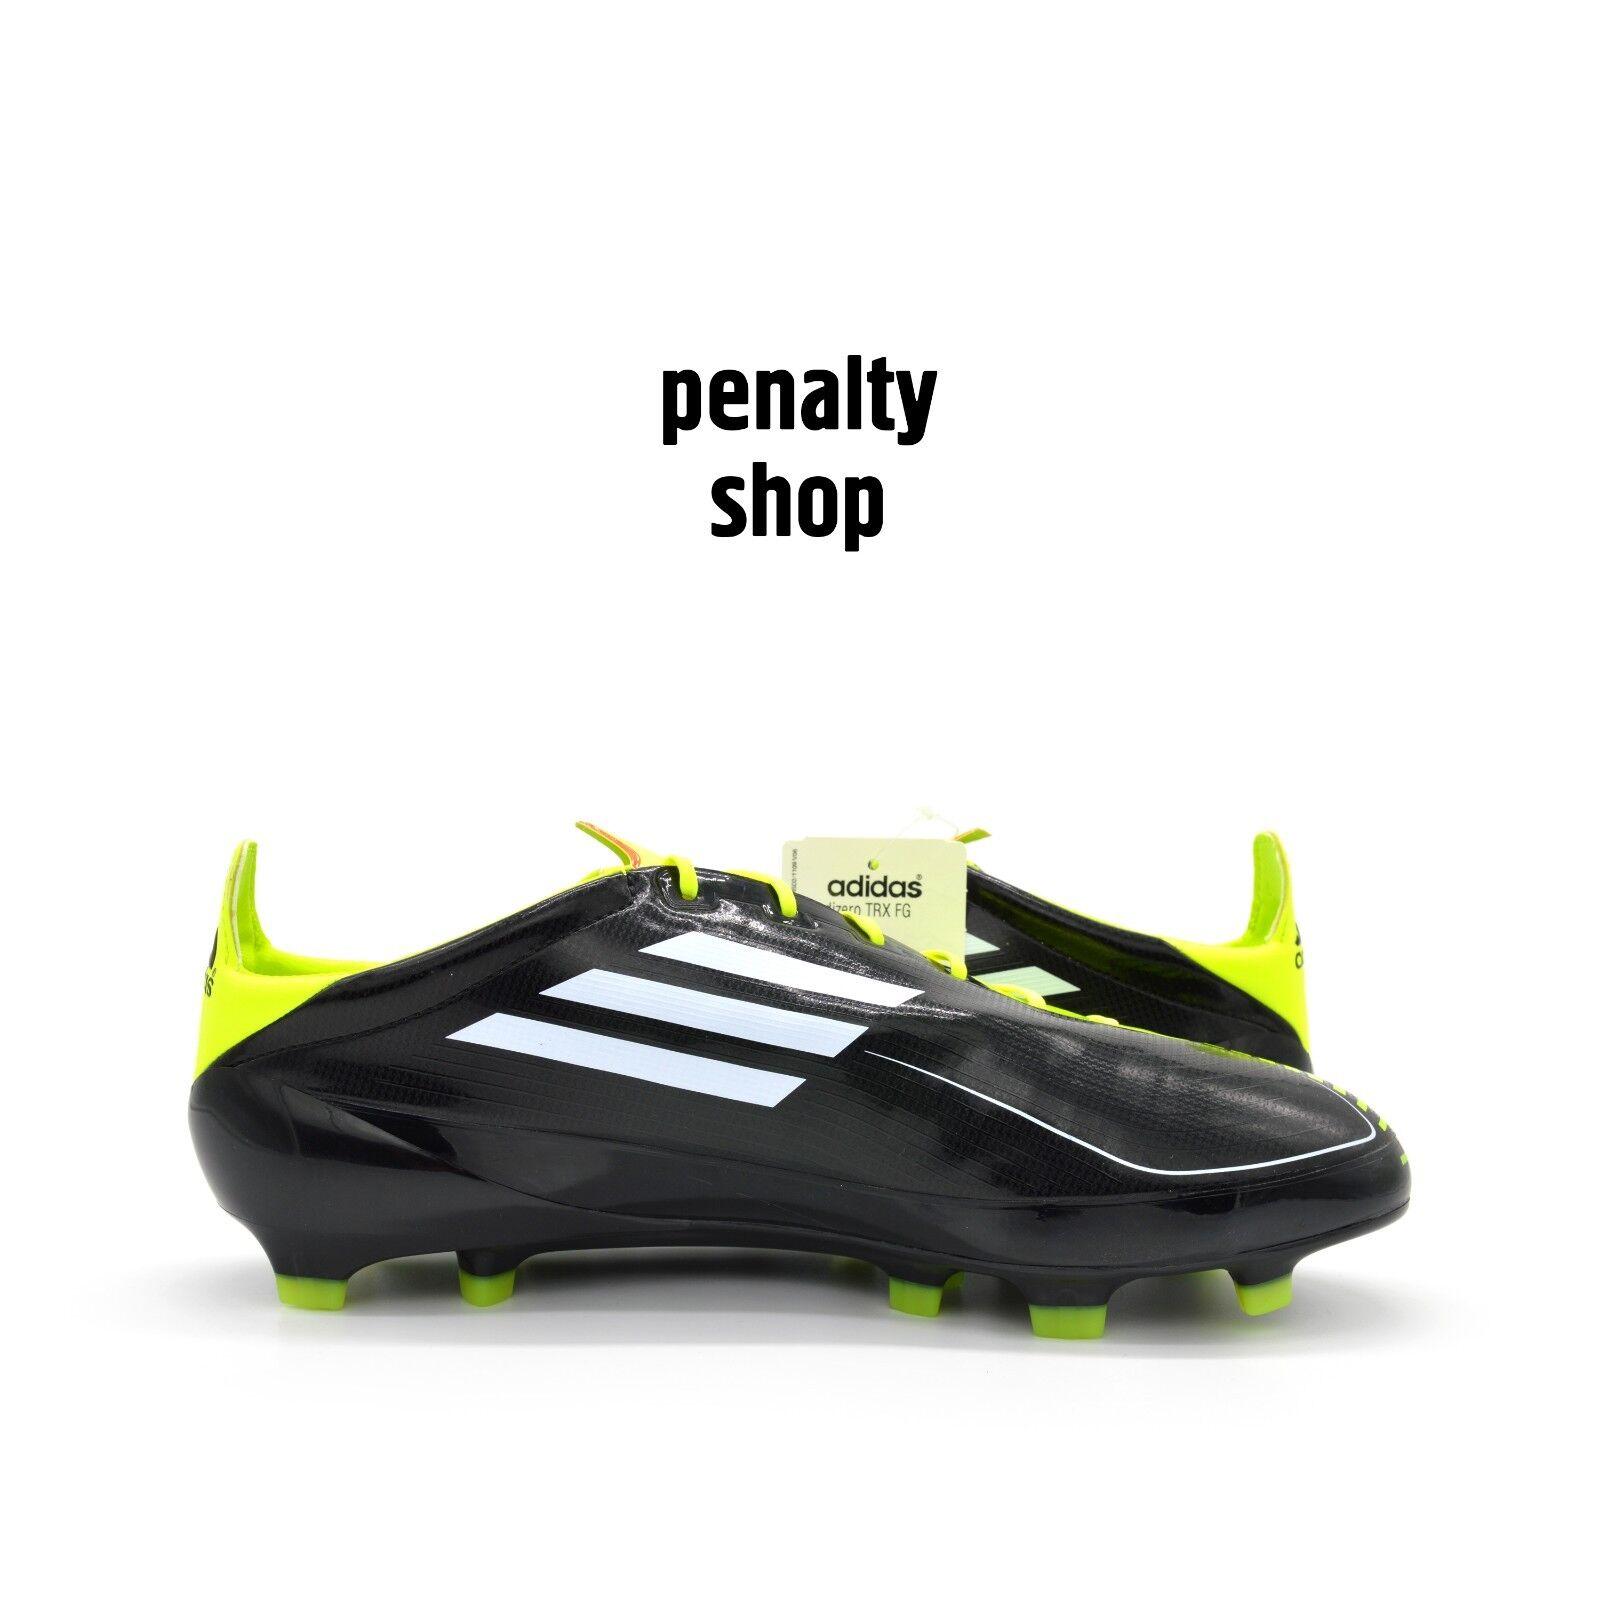 ADIDAS ADIZERO F50 TRX Hg Lea Shoes Football Boots Size 43 48, 5 Yellow New